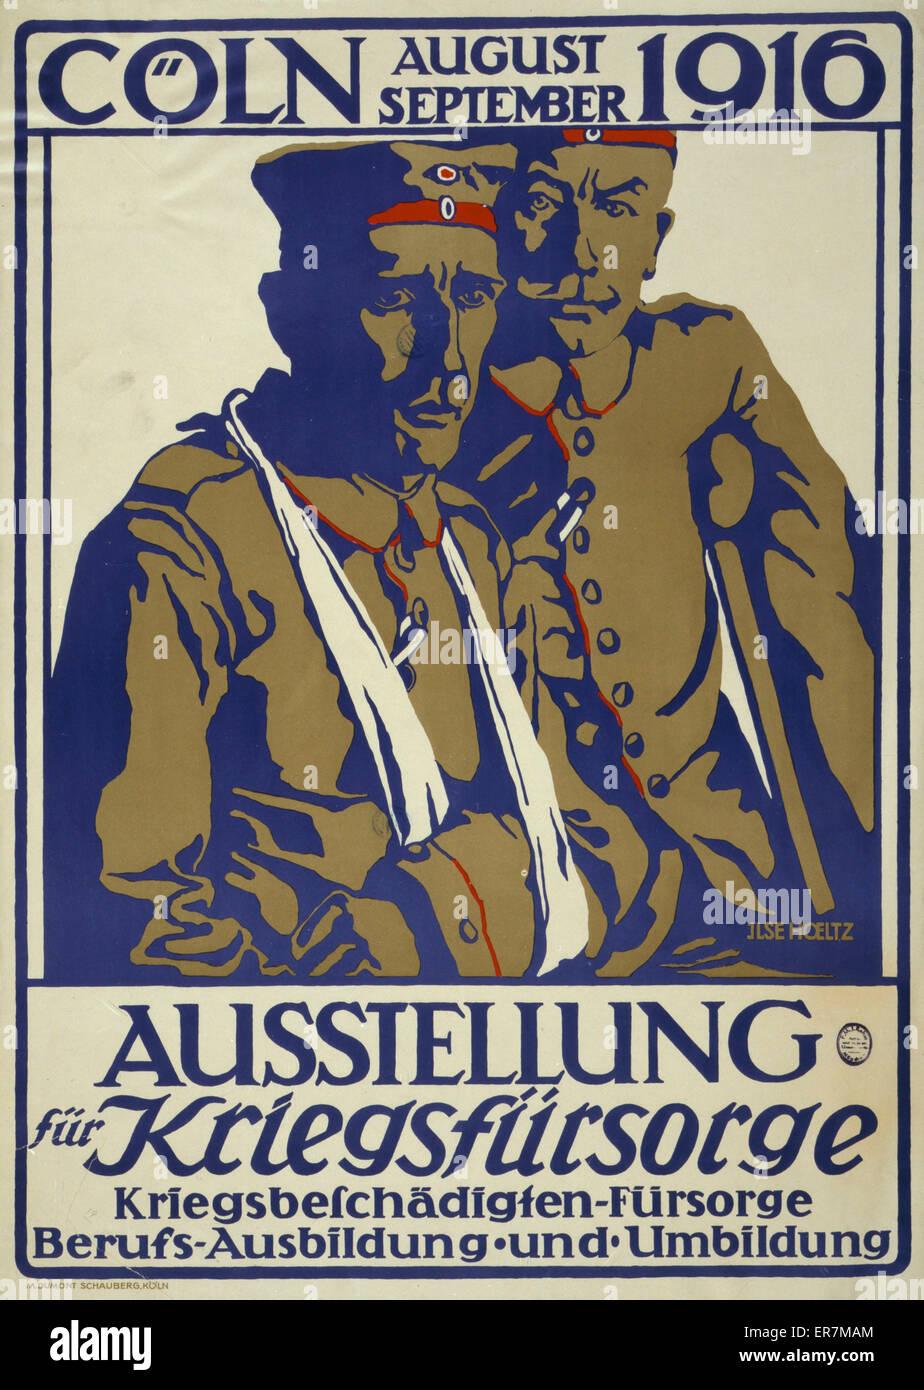 Ausstellung Kriegsfursorge pelliccia, Coln, agosto-settembre 1916; Kriegsbeschadigten-fursorge, Berufs-Ausbildung Immagini Stock